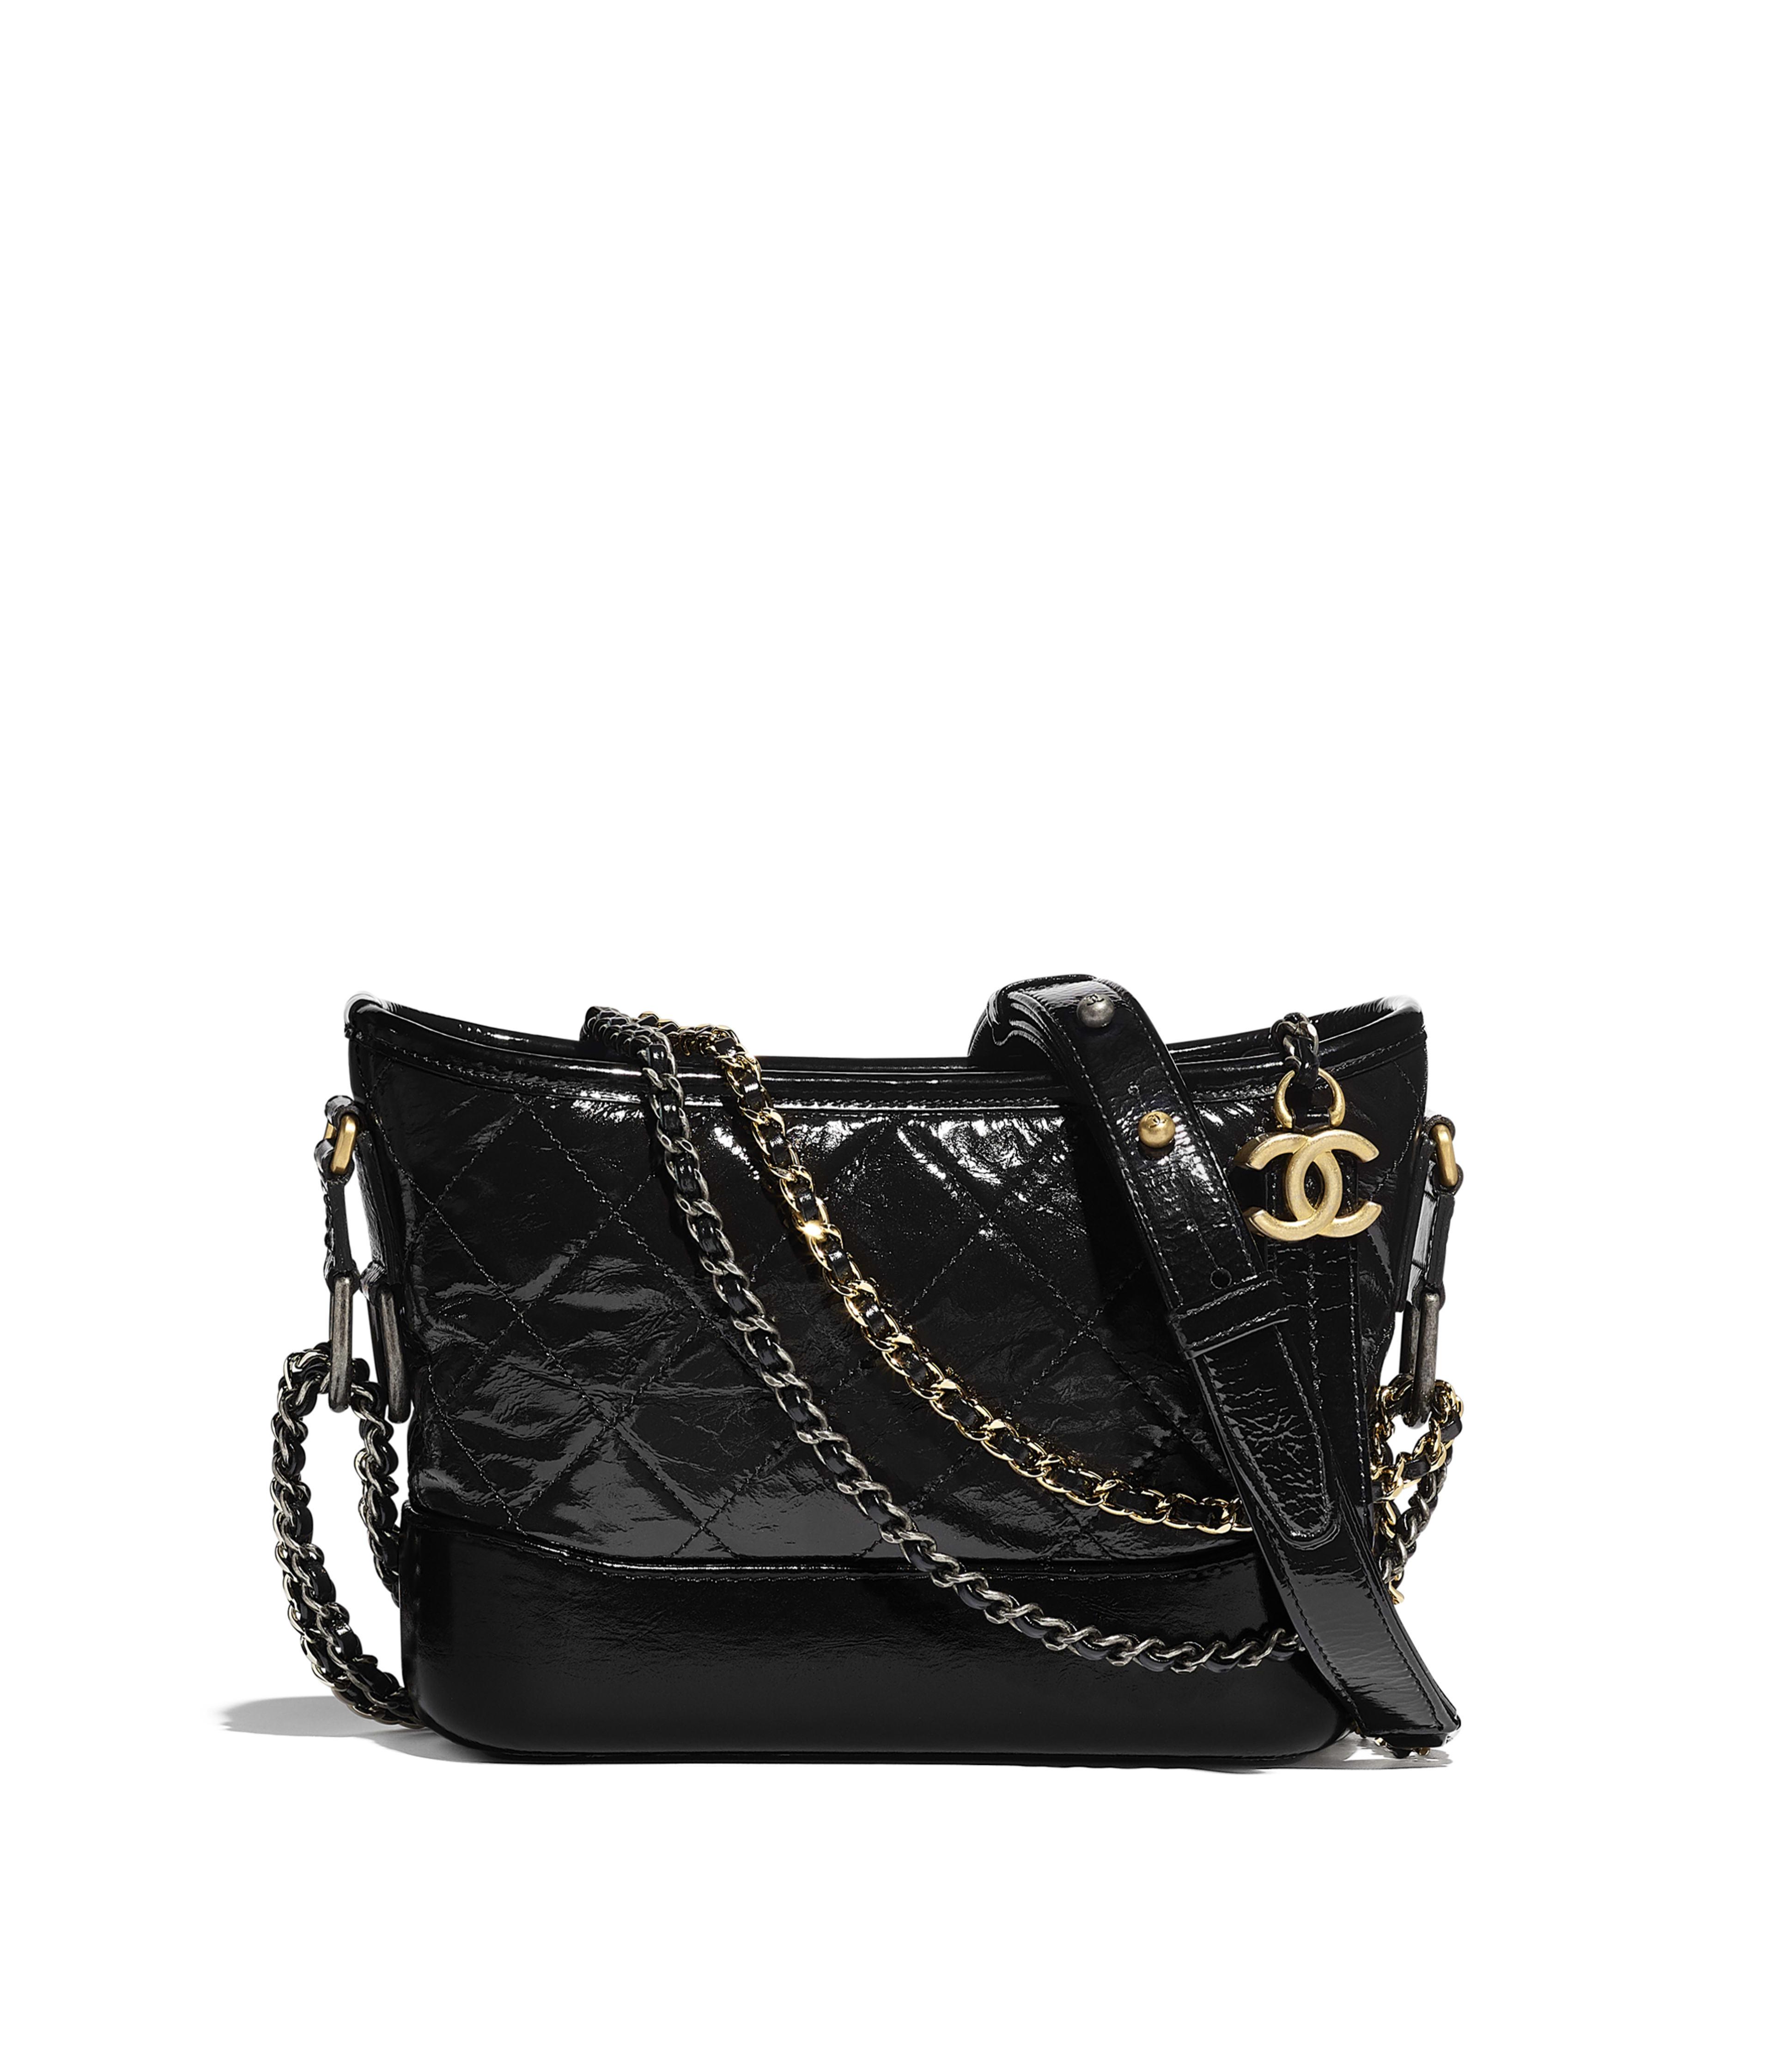 Chanel S Gabrielle Bag Handbags Chanel